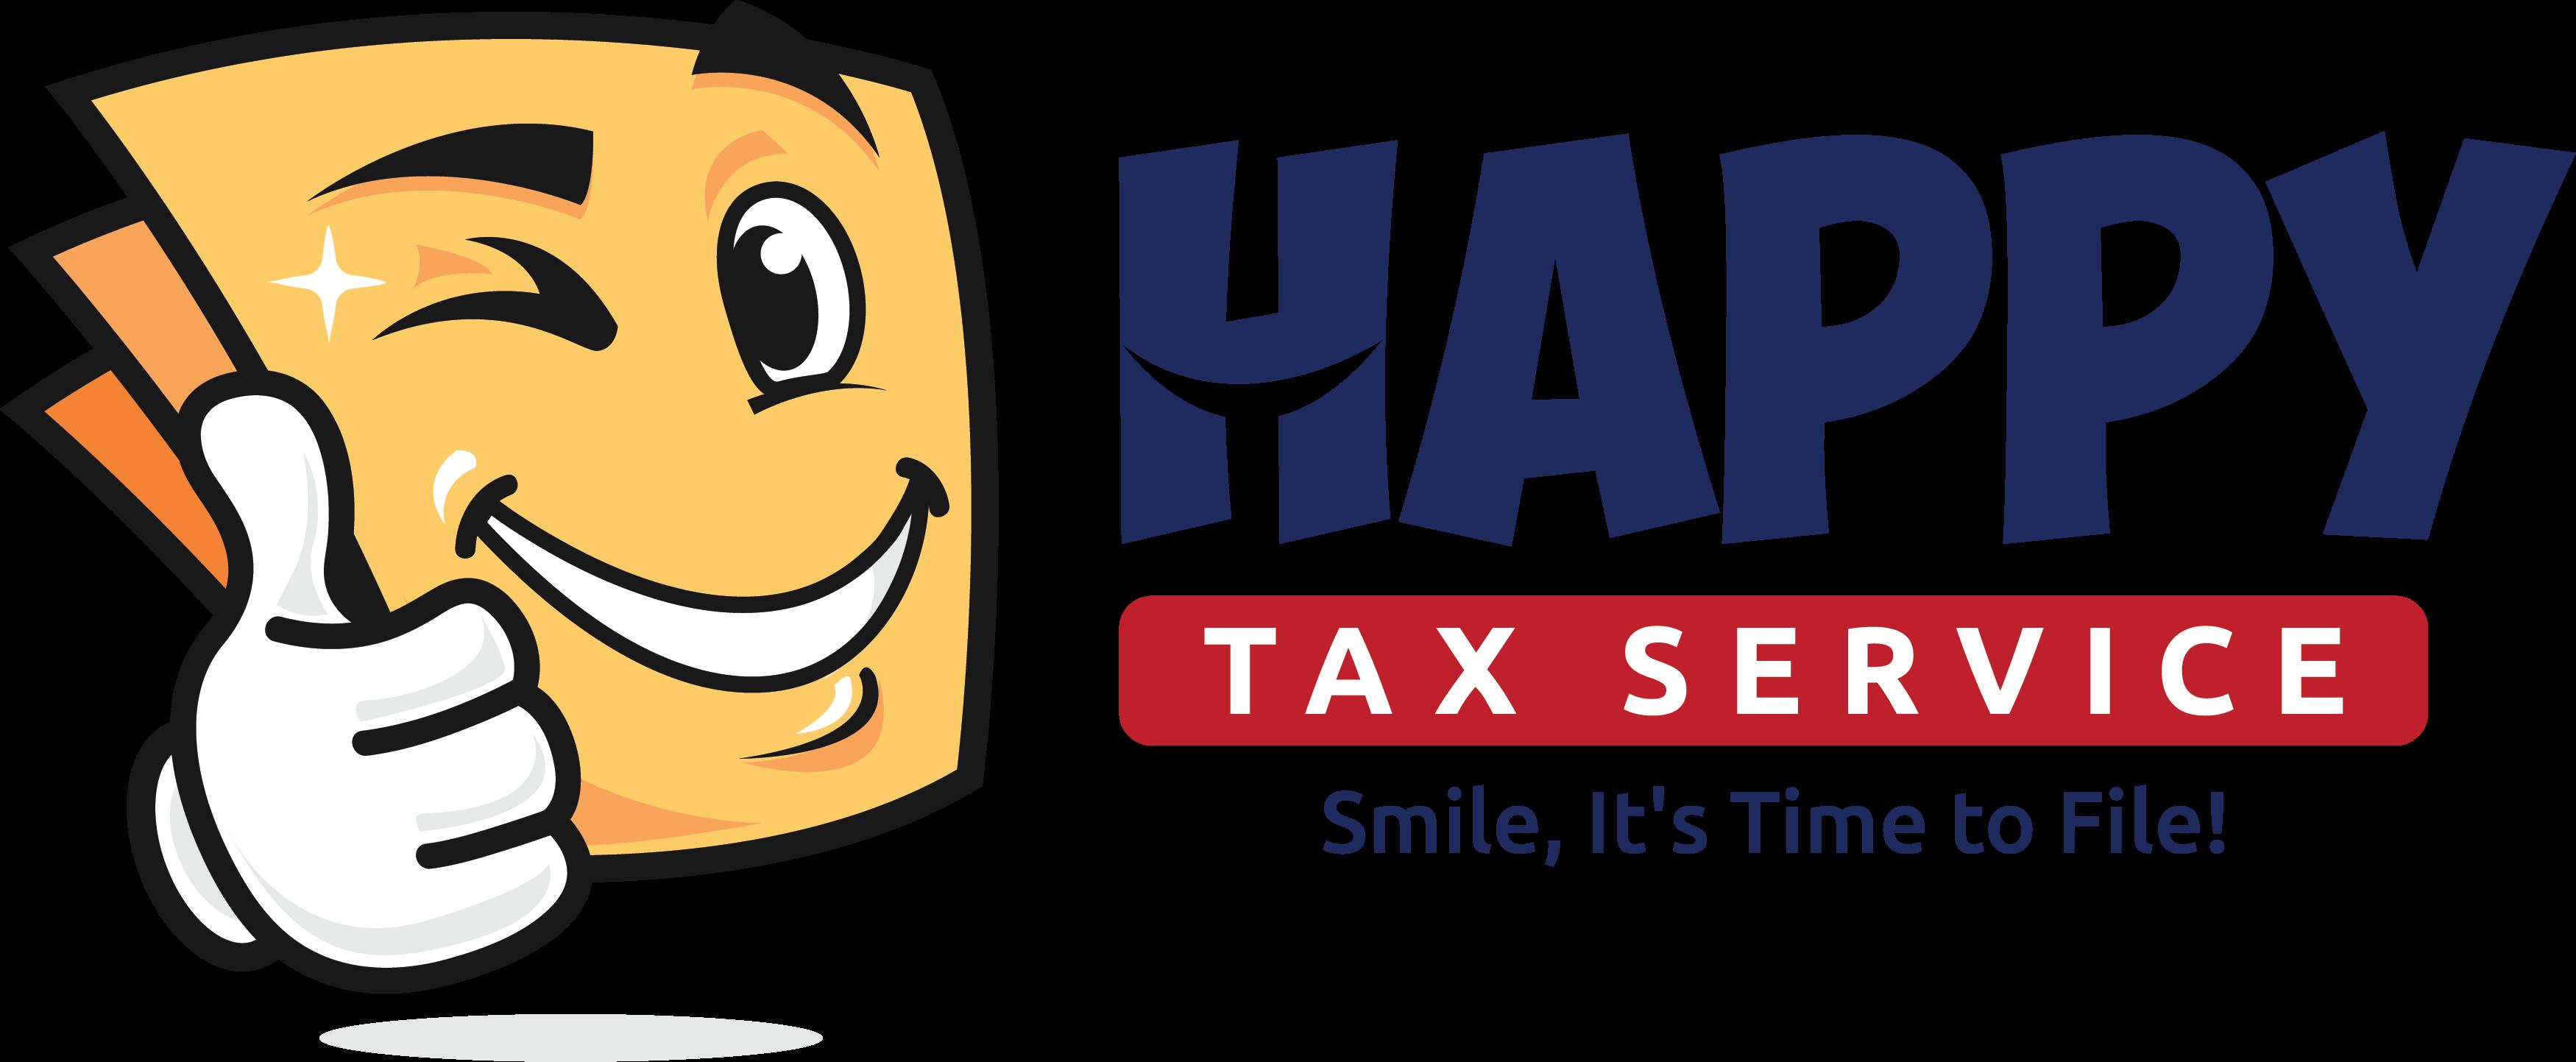 Tax clipart cpa. Happy convenient prepared returns